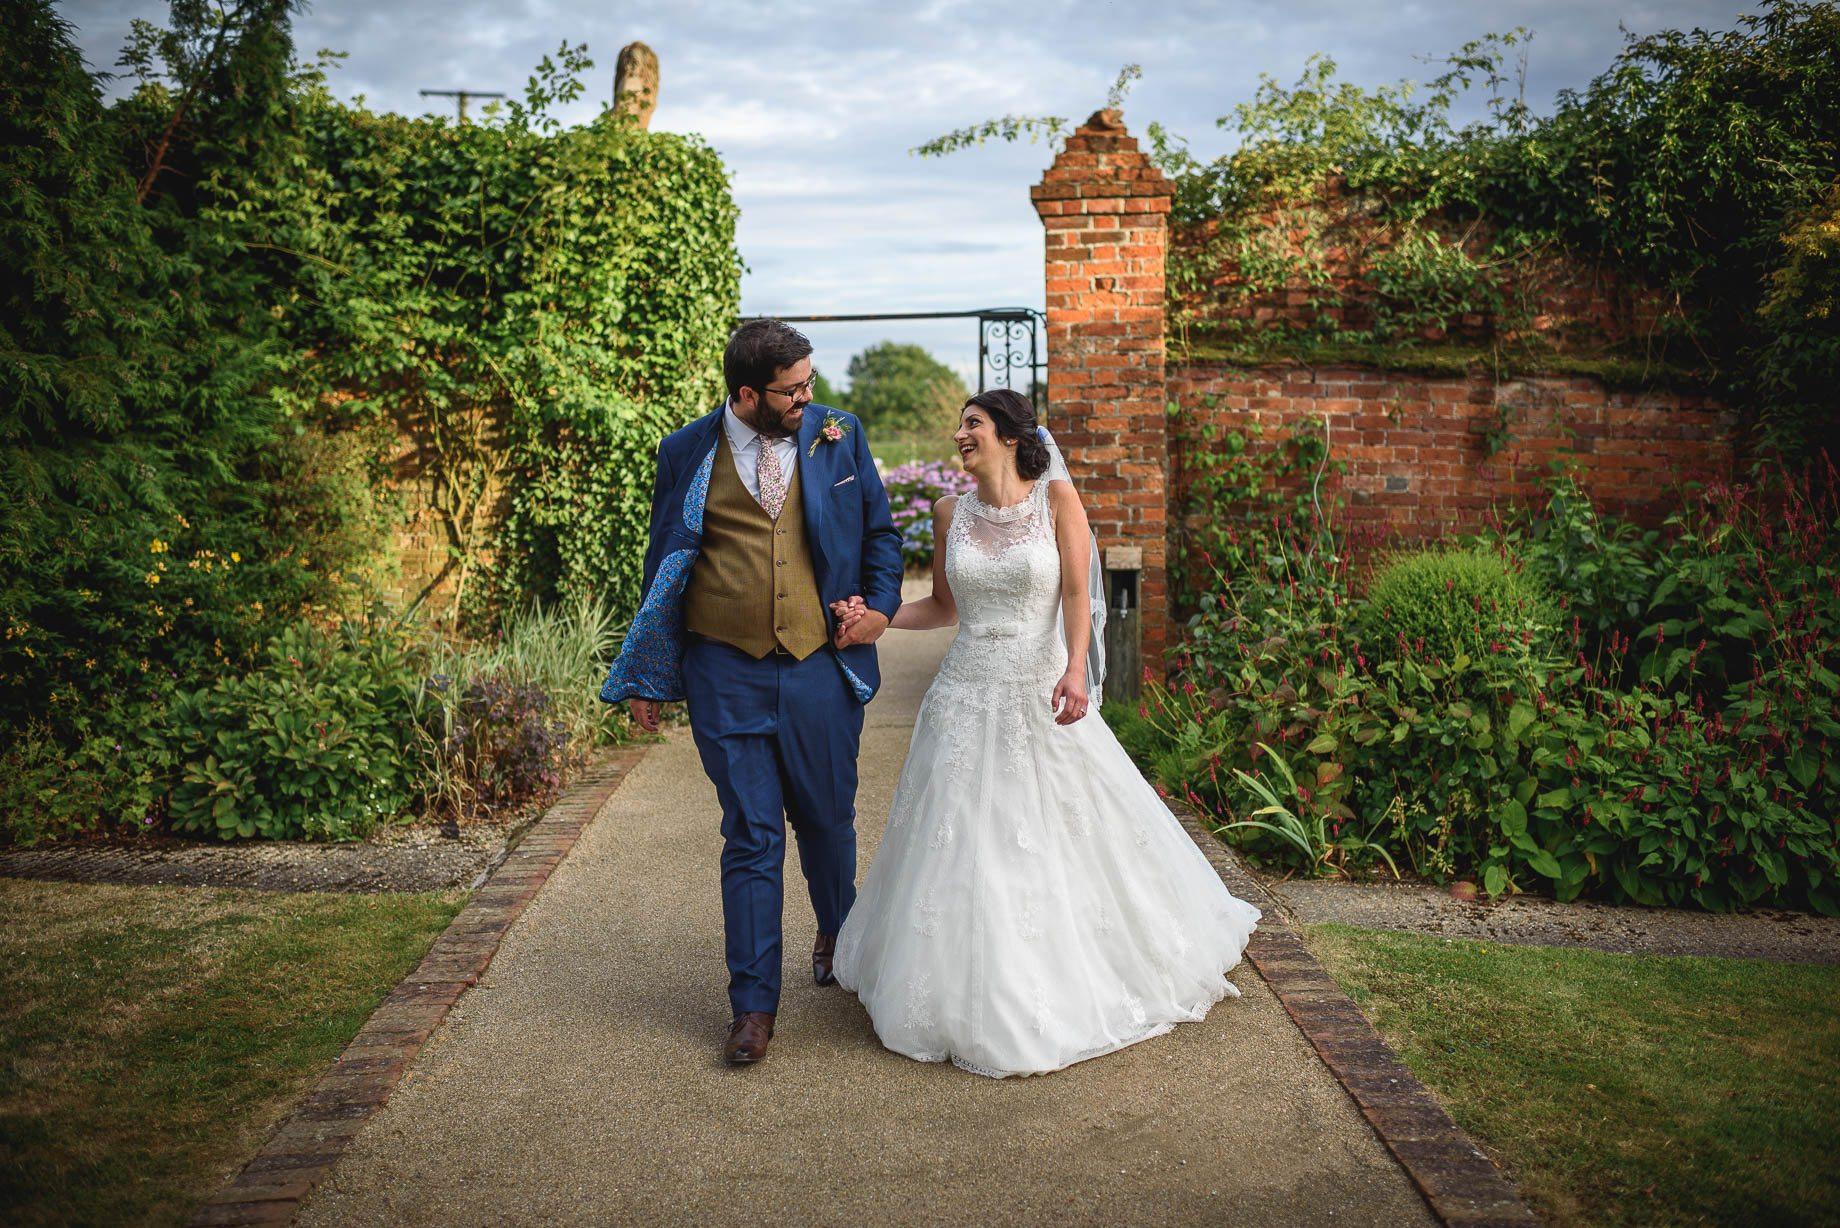 Gaynes Park wedding photography - Guy Collier Photography - Rachel and Jon